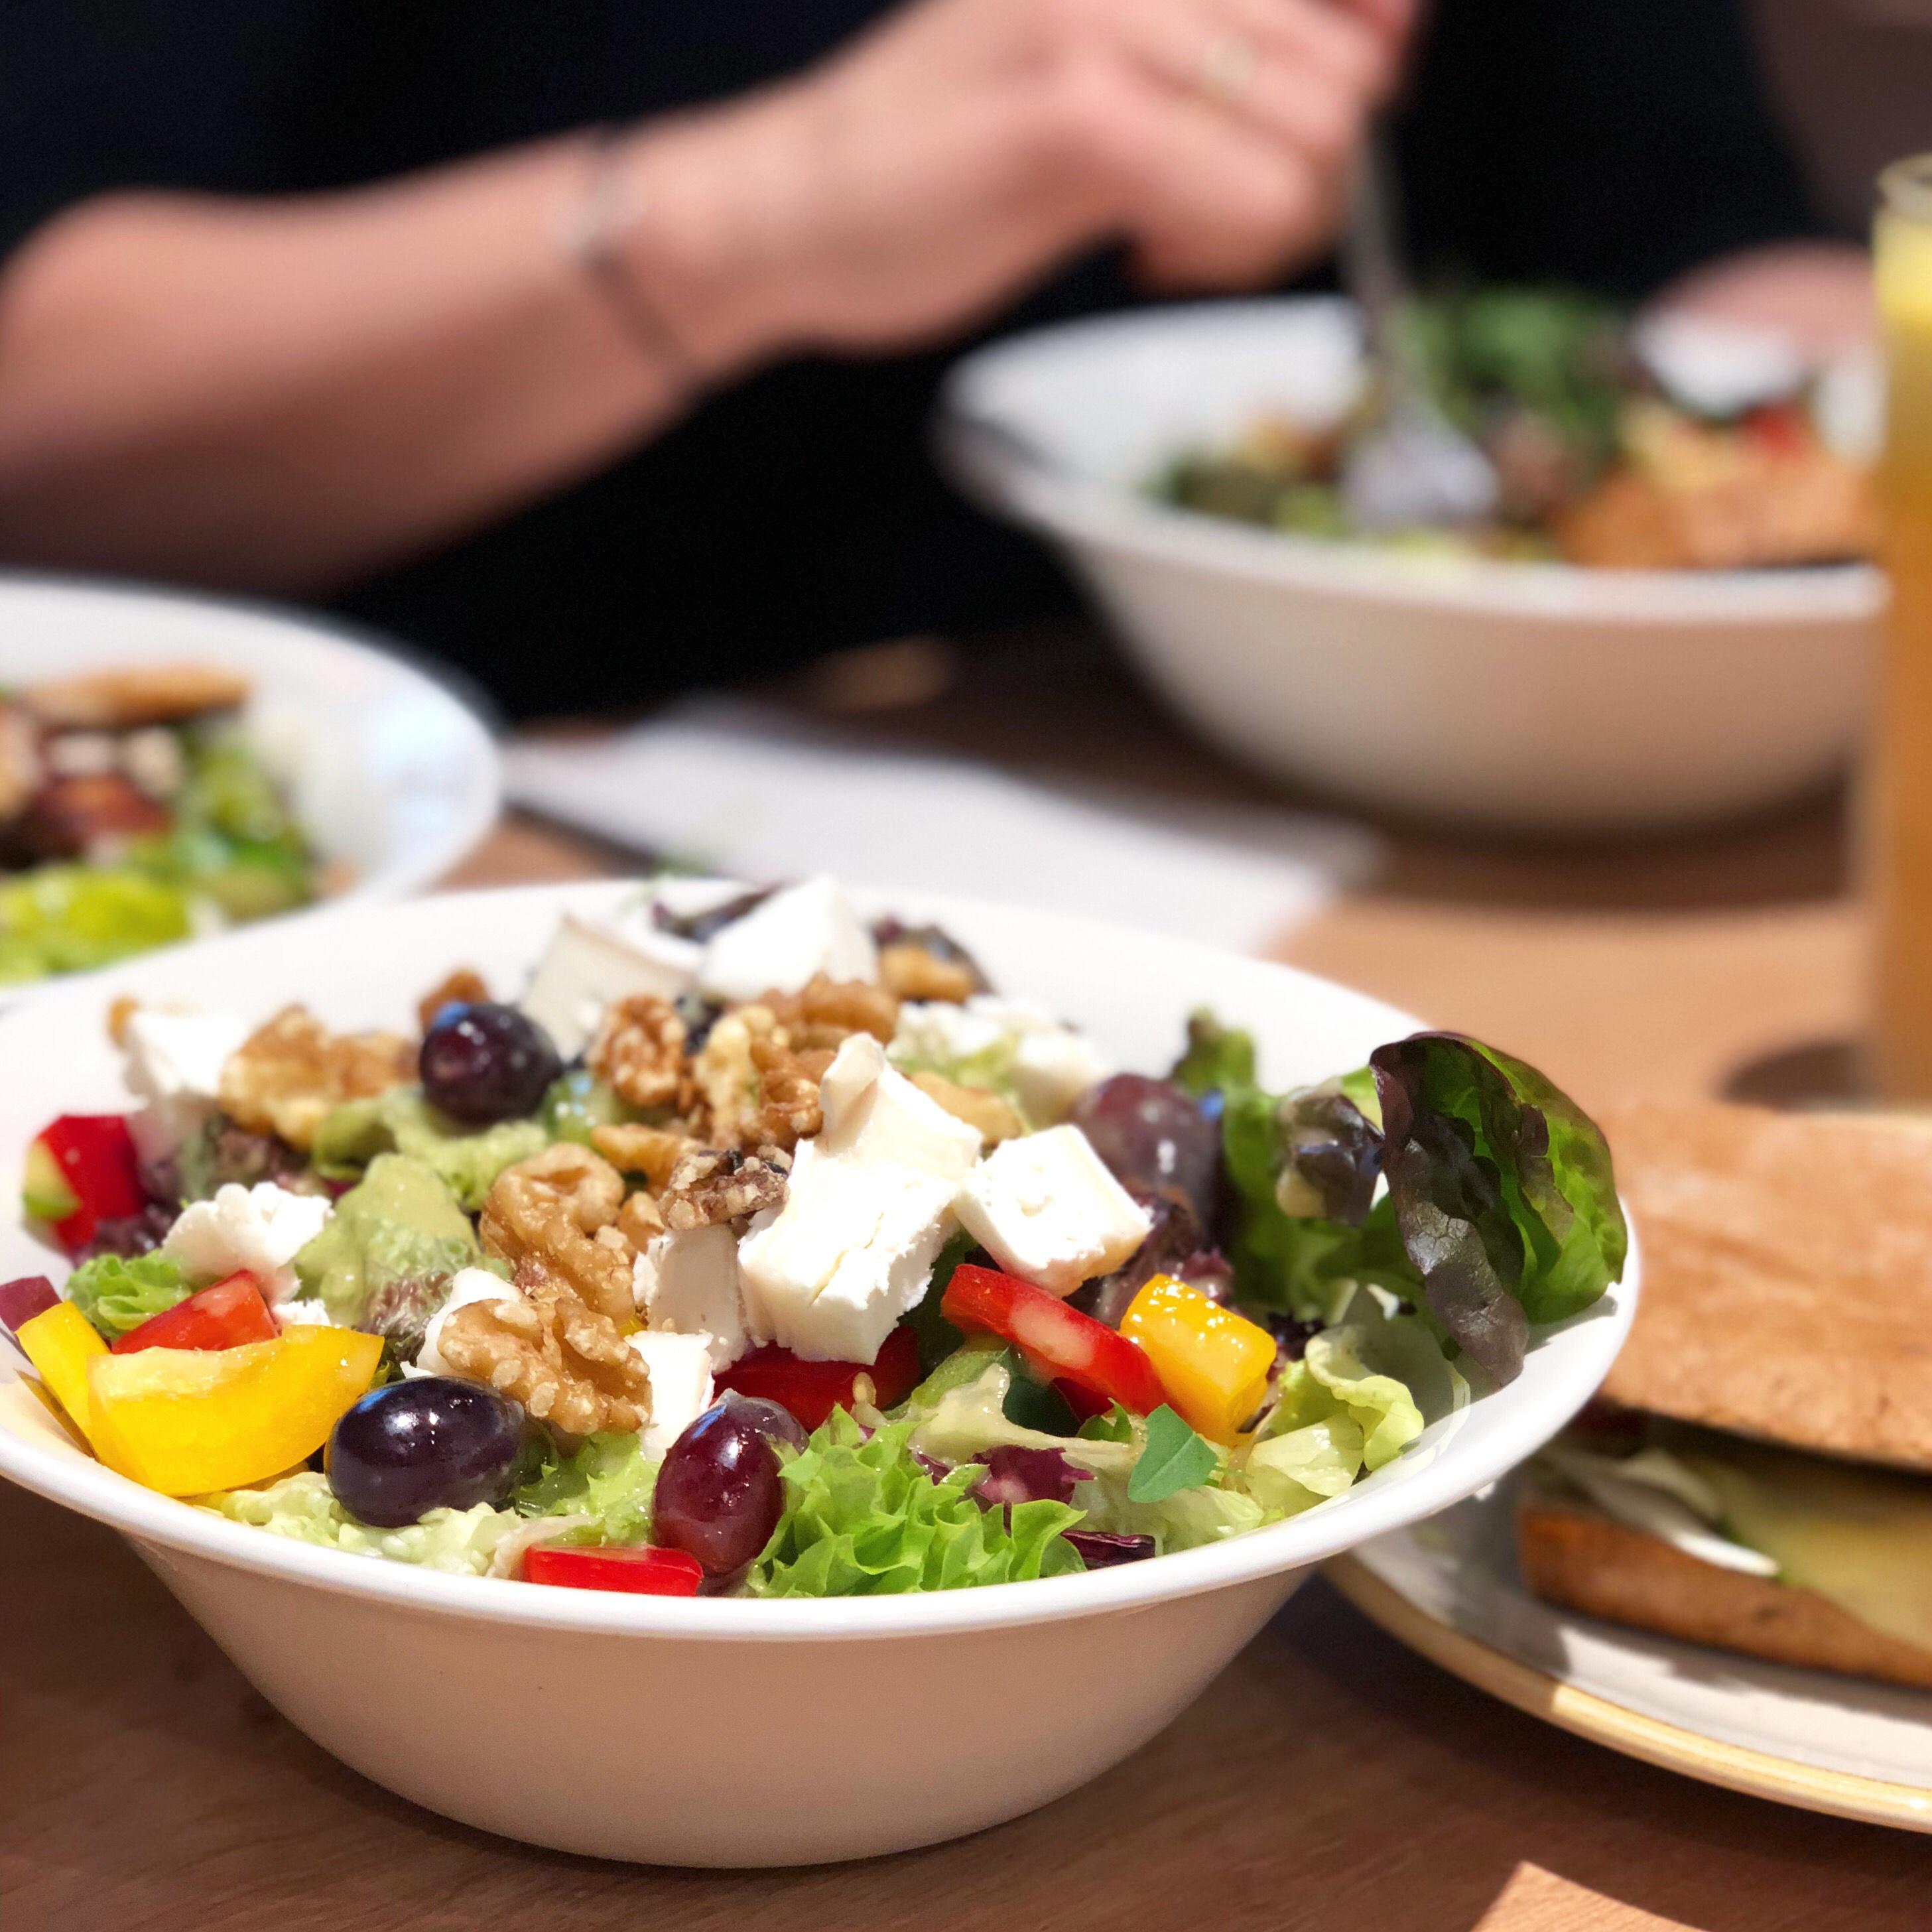 Freitagslieblinge: Salat | berlinmittemom.com